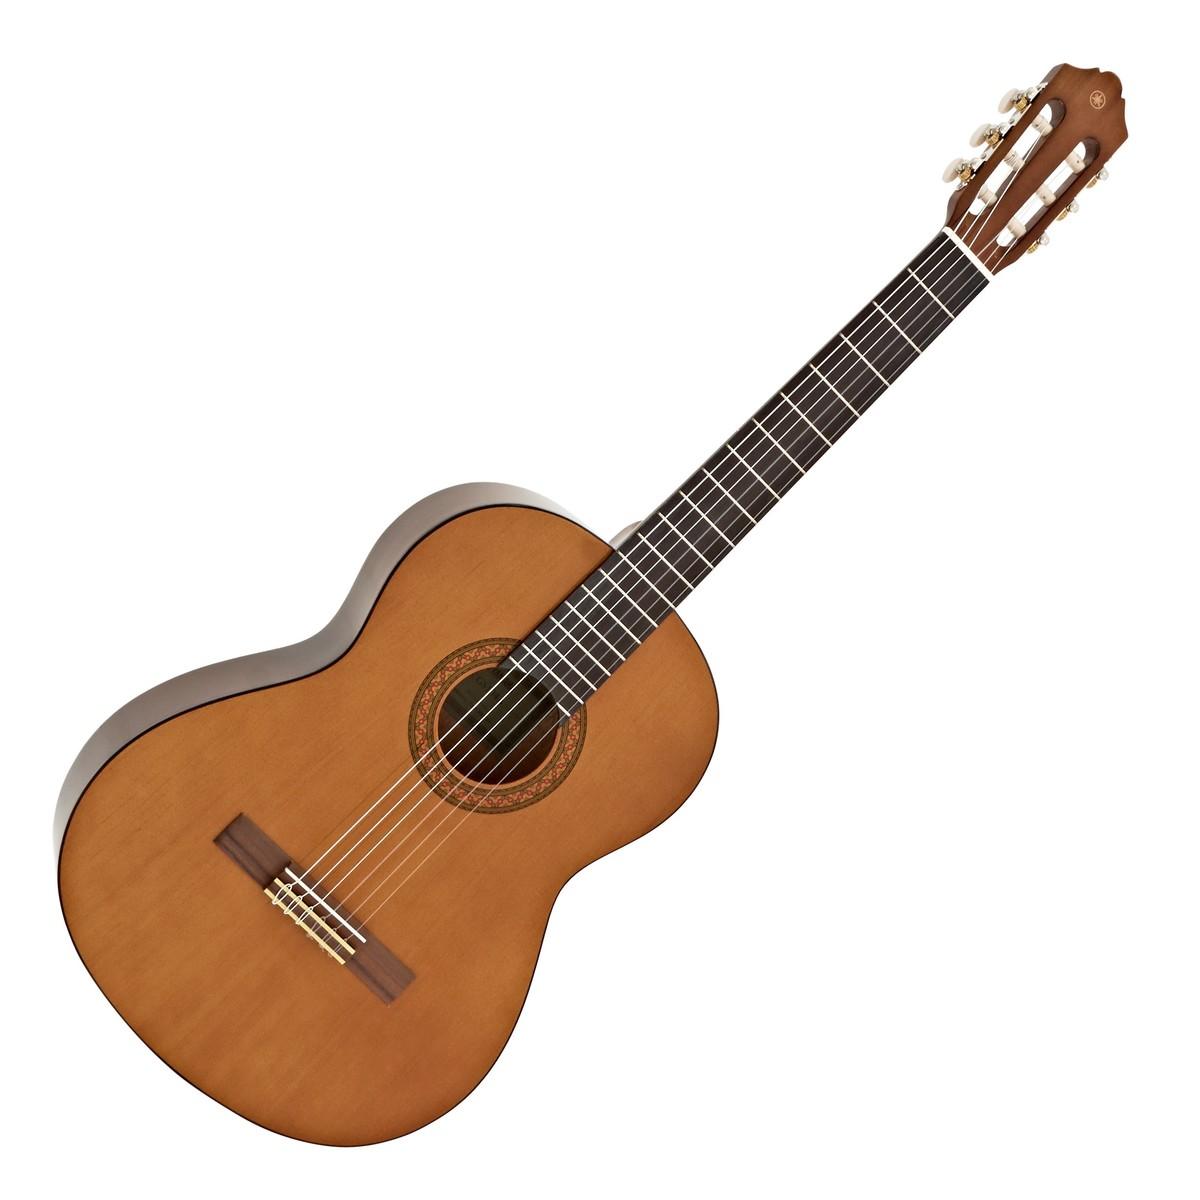 yamaha cgs104aii classical guitar natural gloss at gear4music. Black Bedroom Furniture Sets. Home Design Ideas